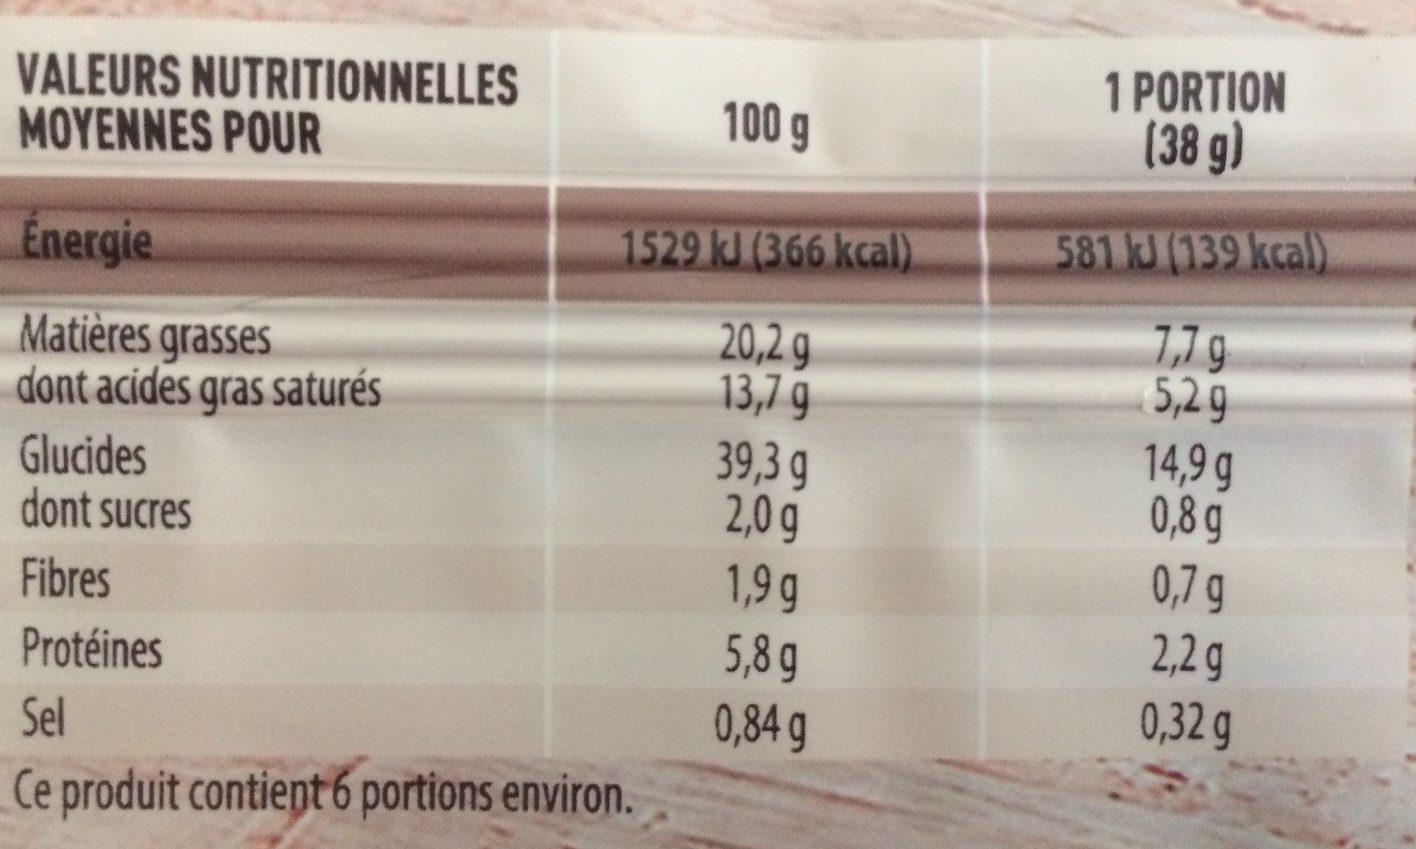 Pâte Feuilletée Pur Beurre - Voedingswaarden - fr